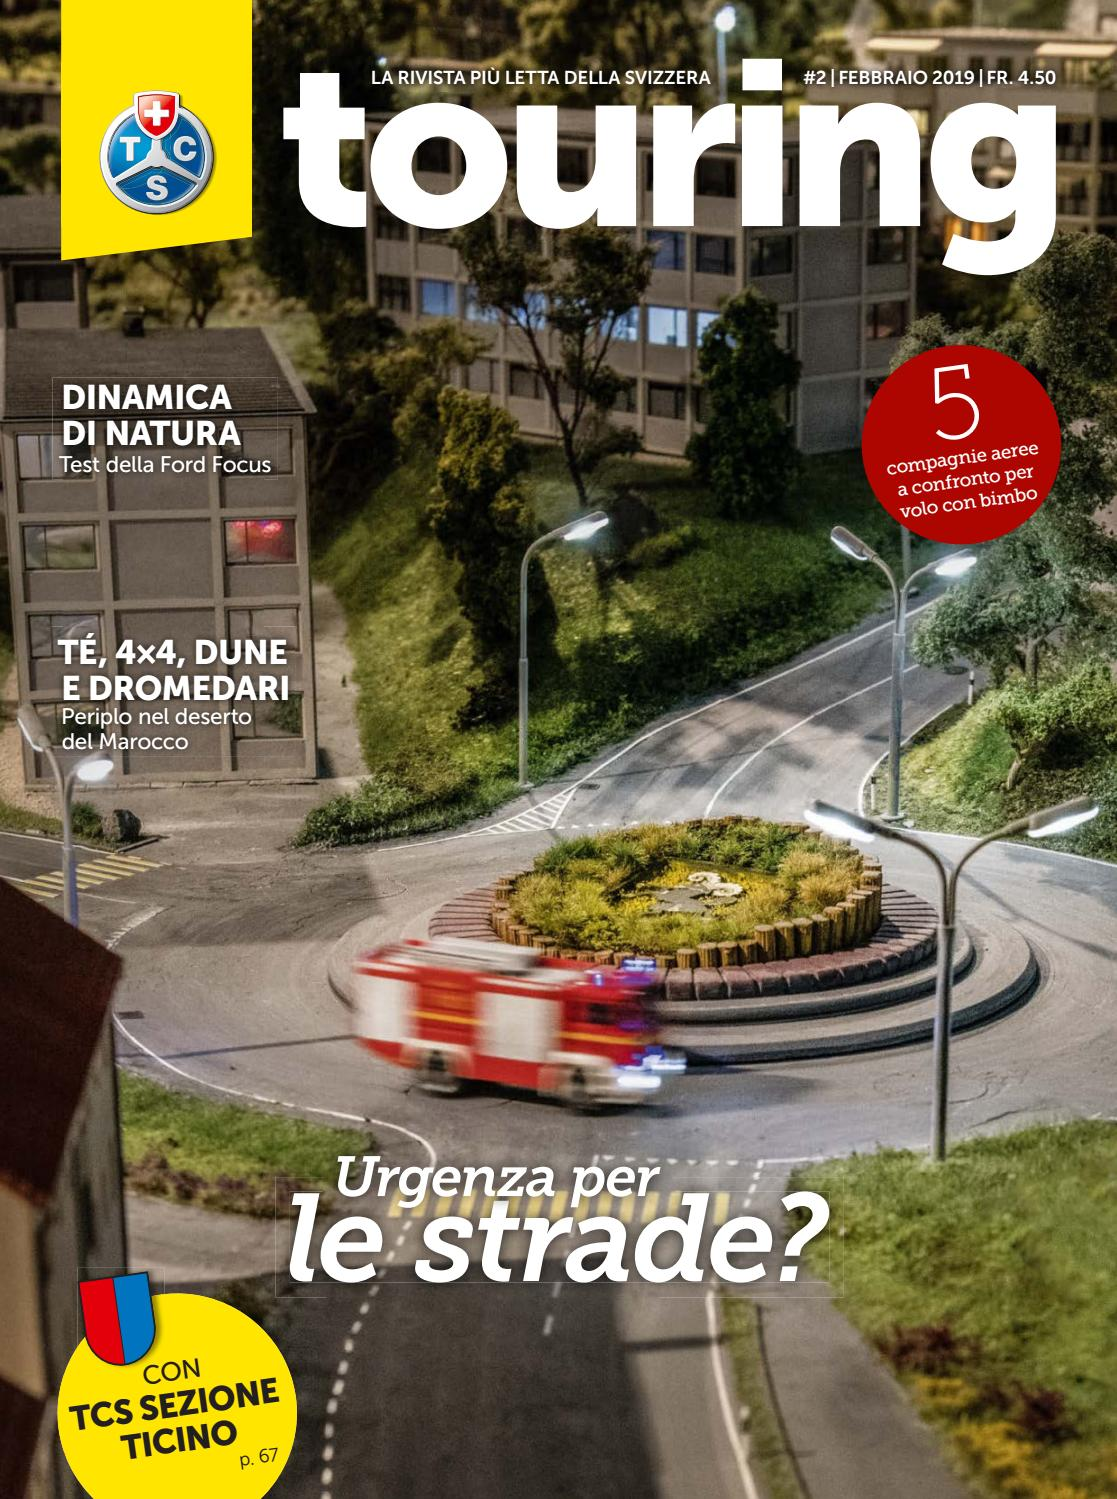 fb3e4eeaf2 Touring 02 / 2019 italiano by Touring Club Schweiz Suisse Svizzera  Switzerland - issuu